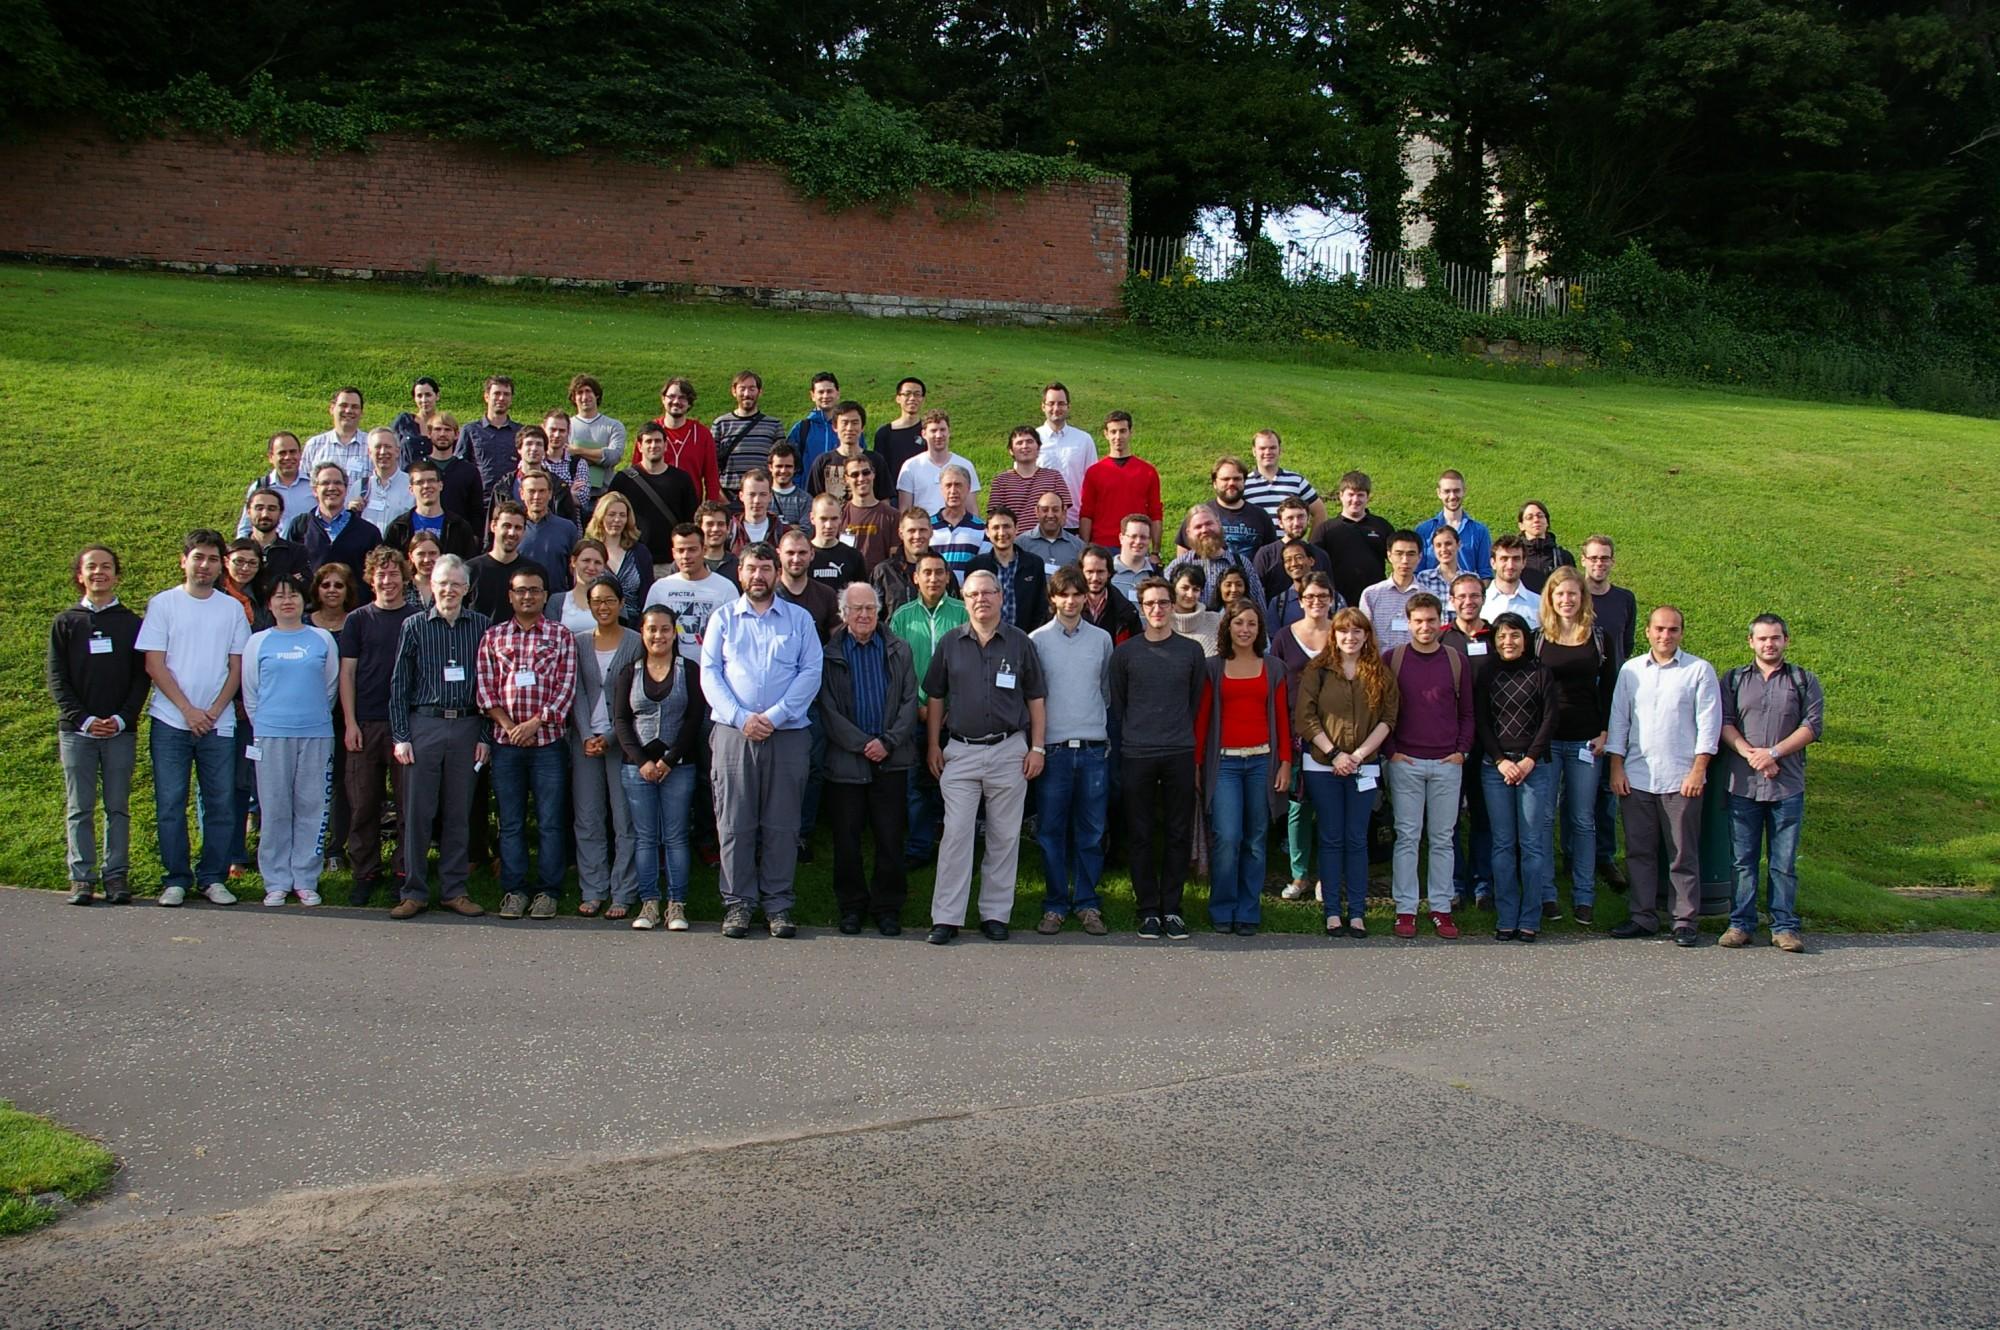 SUSSP69 Group Photograph No. 5 Copyright Alan Walker, University of Edinburgh.